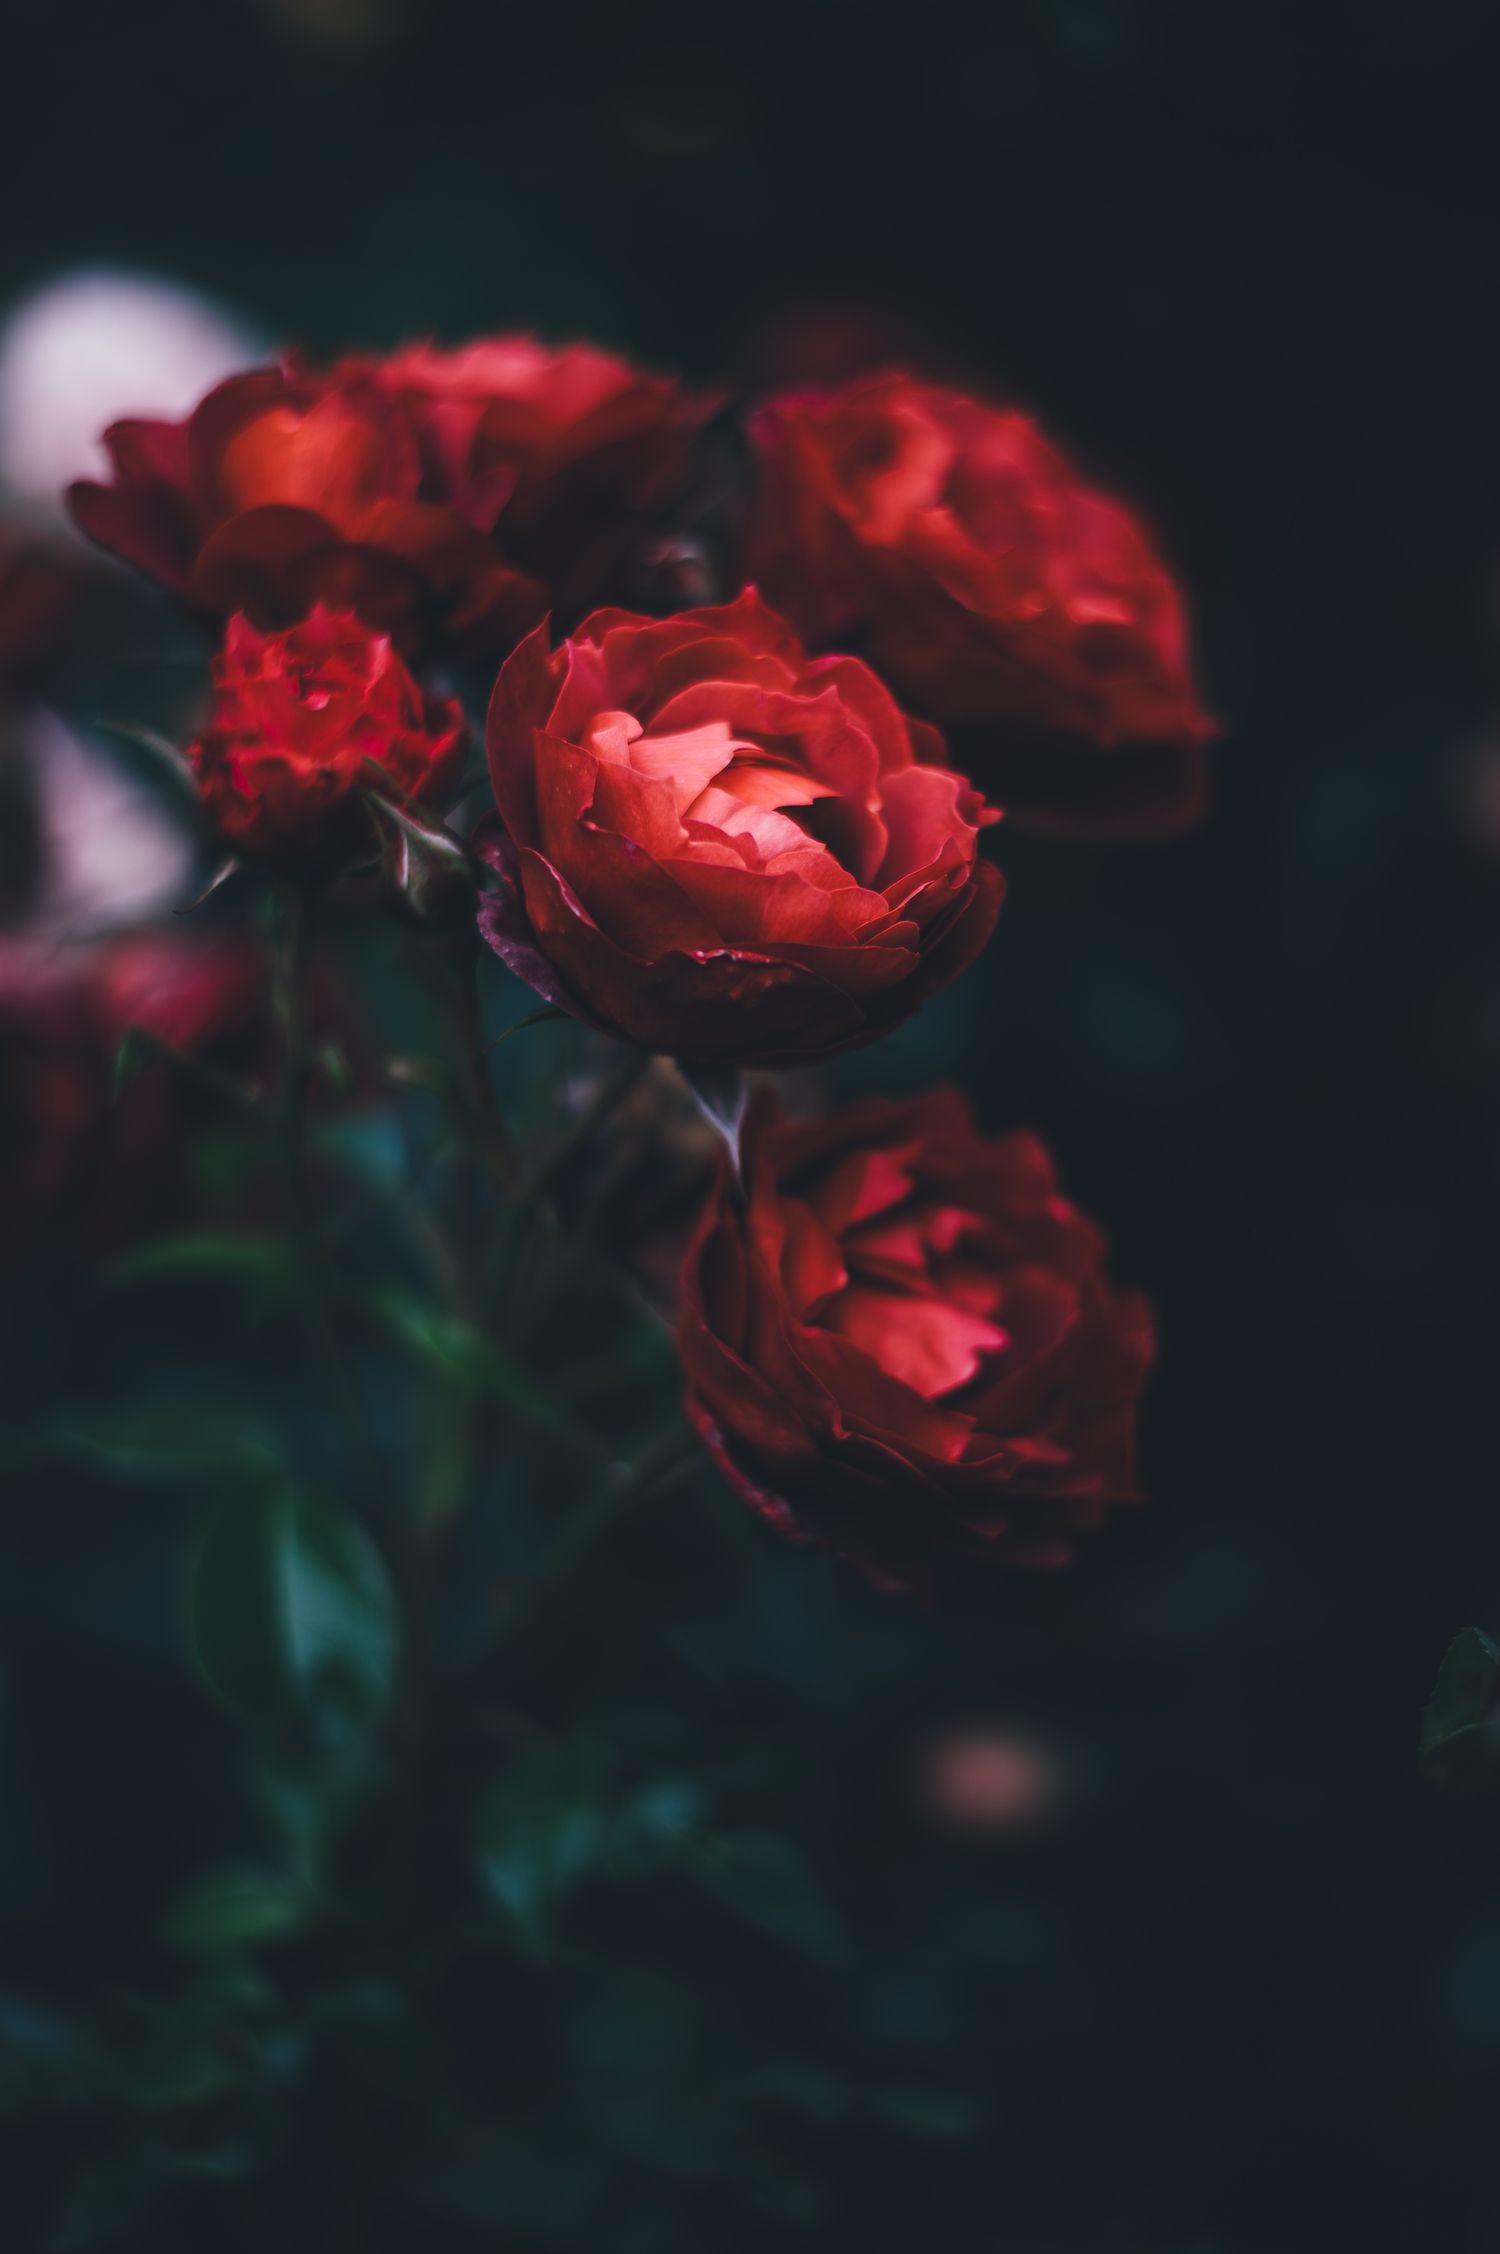 Dark red rose aesthetic wallpaper